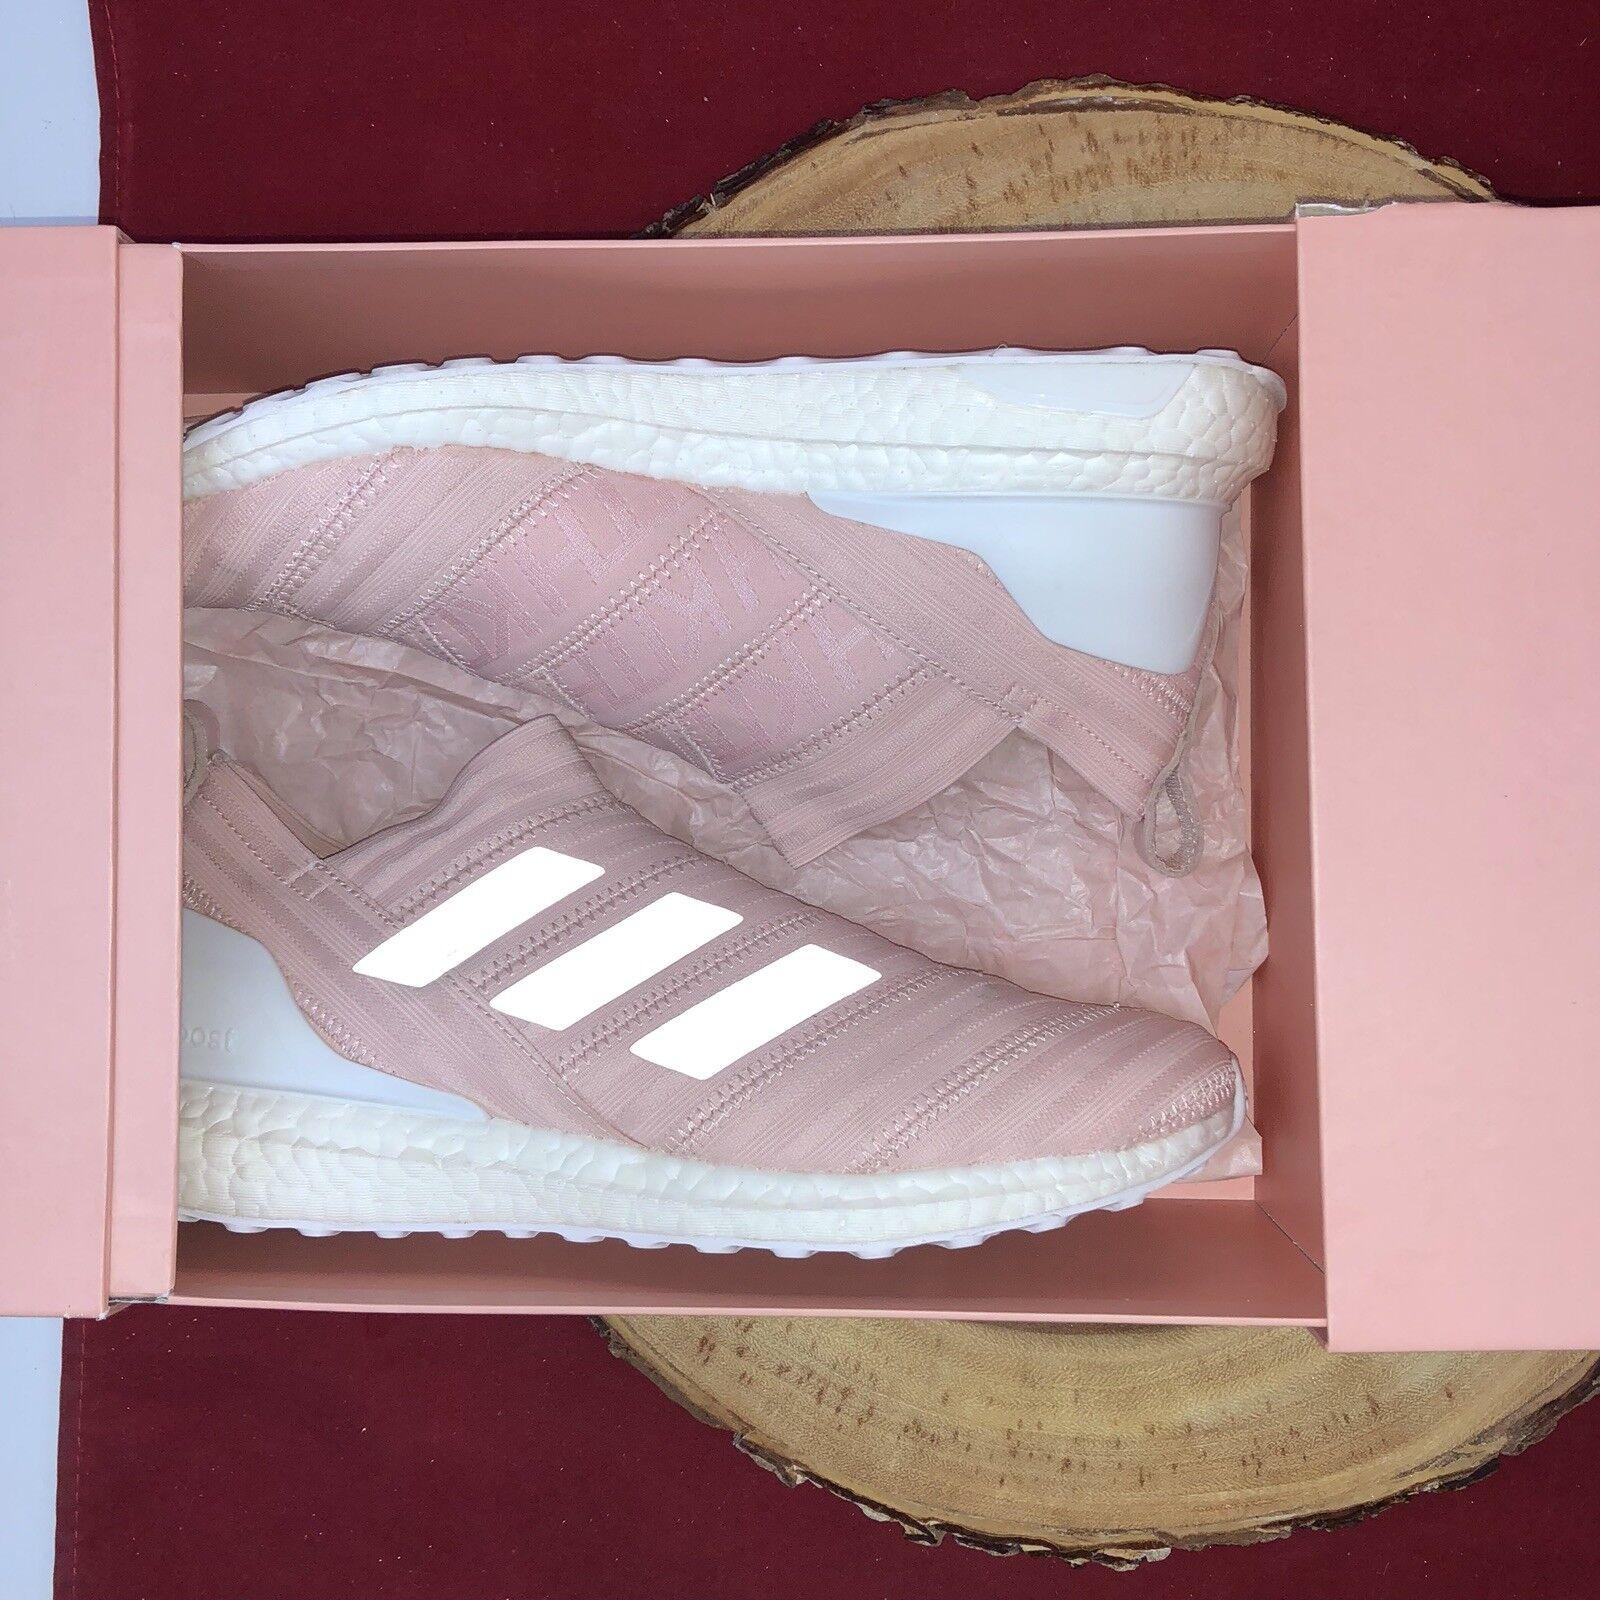 Adidas Nemeziz Tango Ultra Boost Flamingo Größe 9 AC7508 Ultraboost Yeezy Supreme